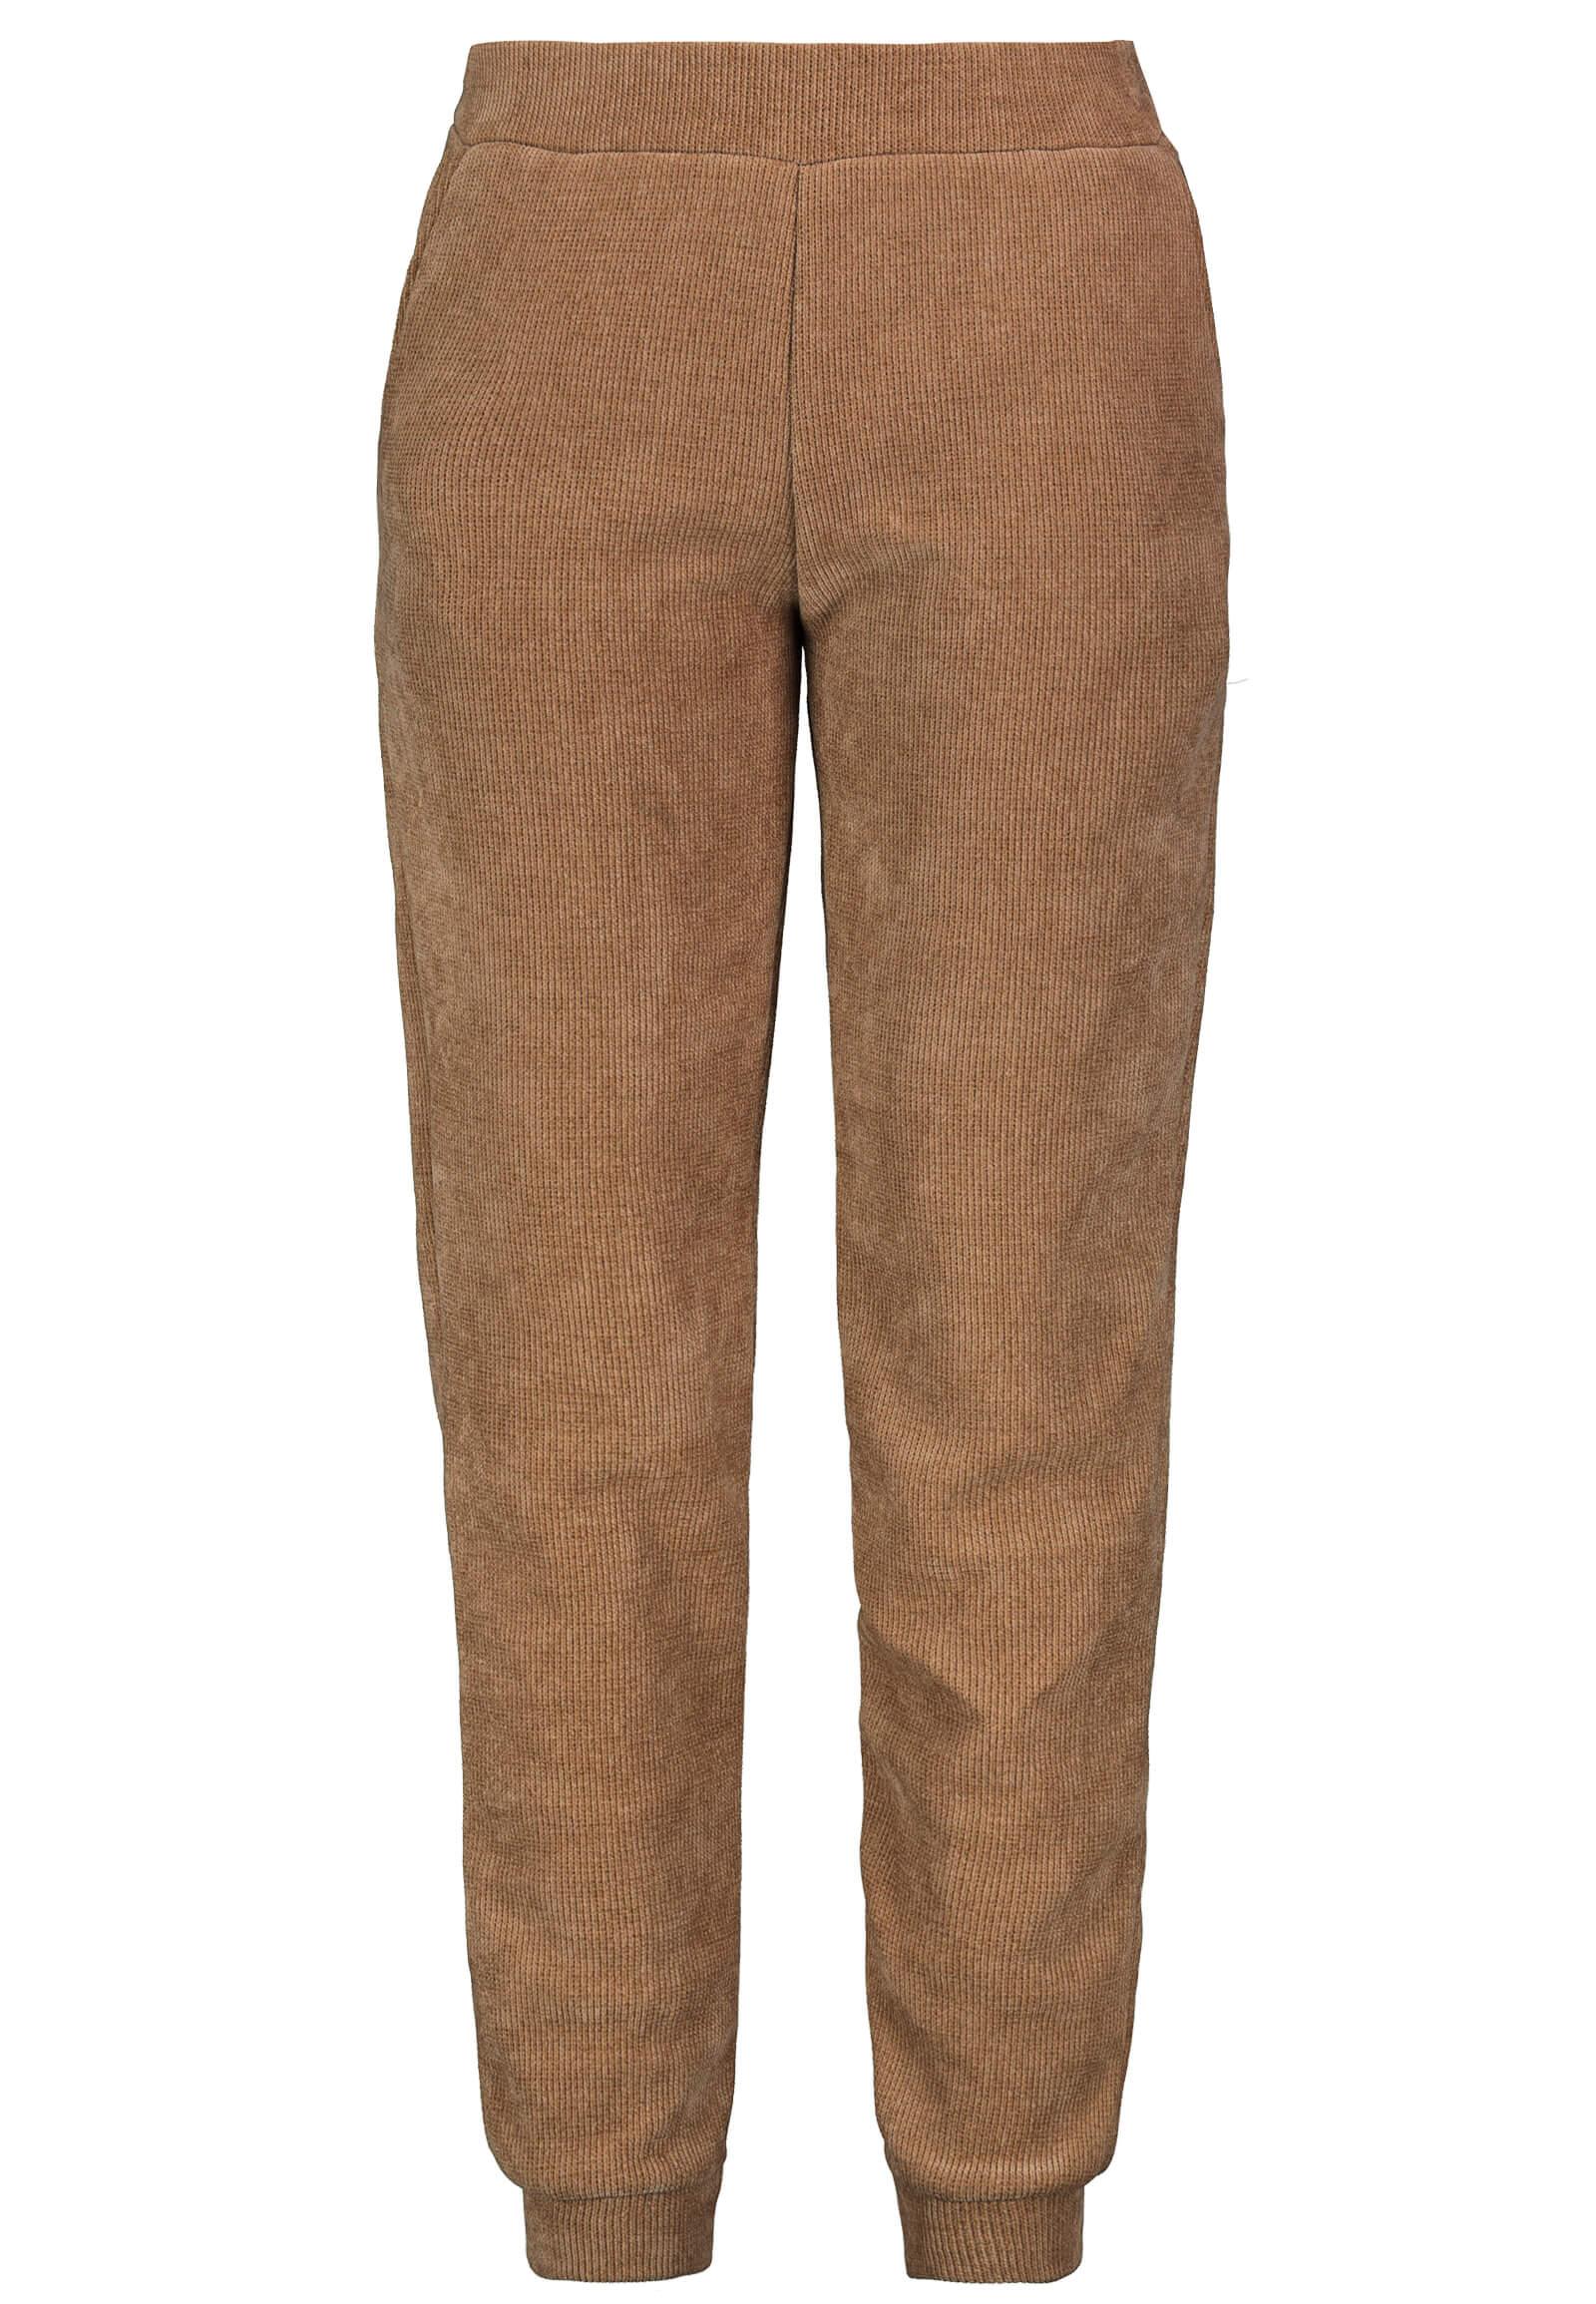 Cord-Hose Loungewear-Set braun